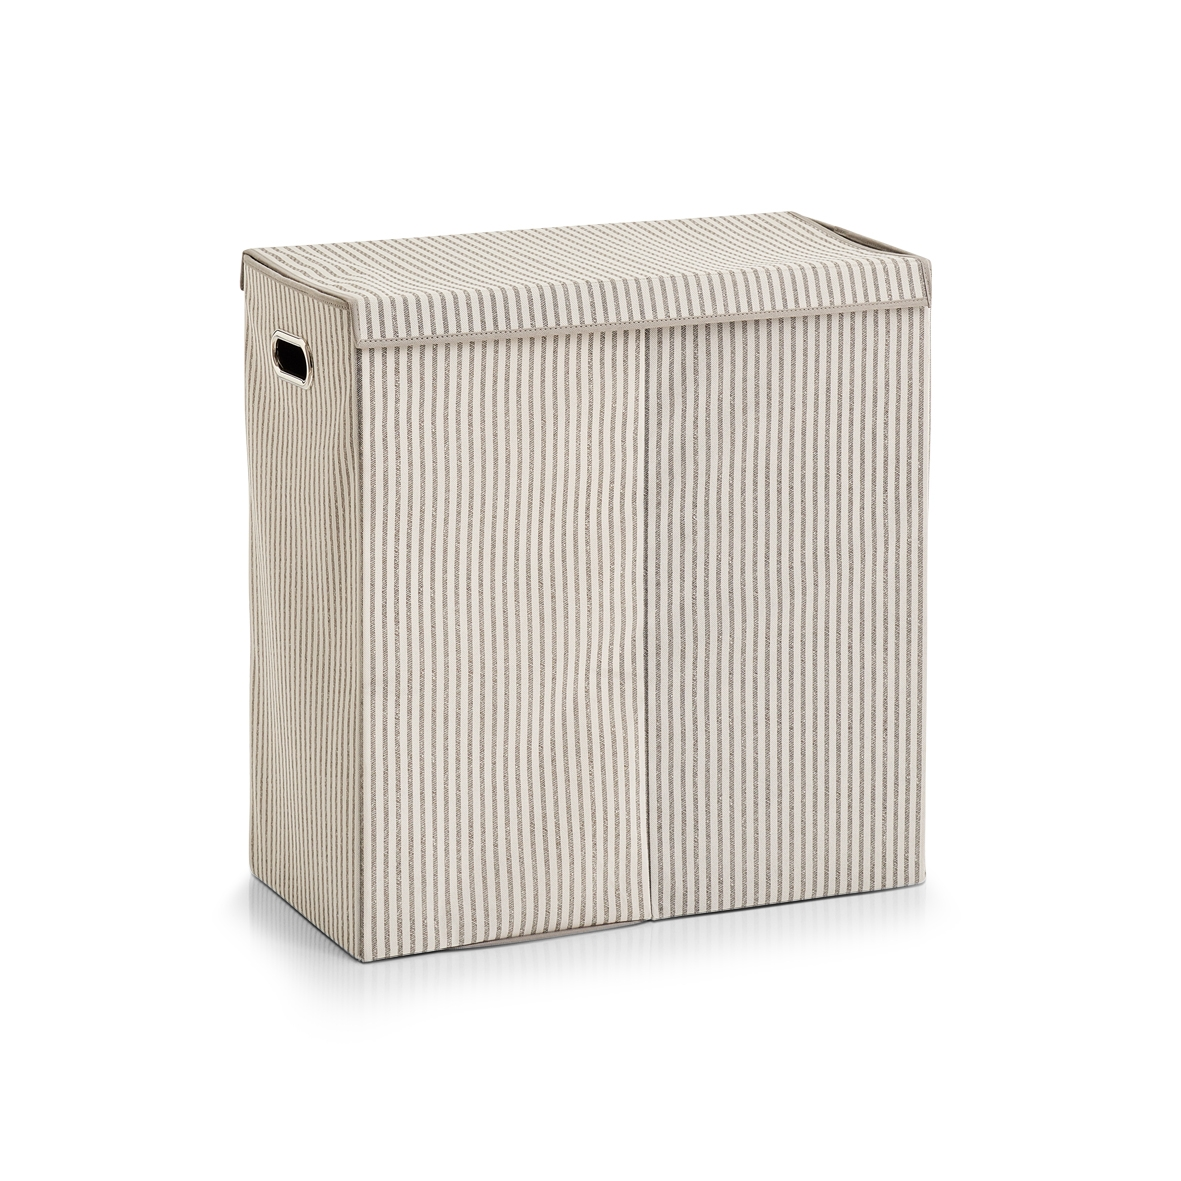 Cos pentru rufe cu capac si 2 compartimente, Fleece, Bej Stripes, l61,5xA31xH63 cm imagine